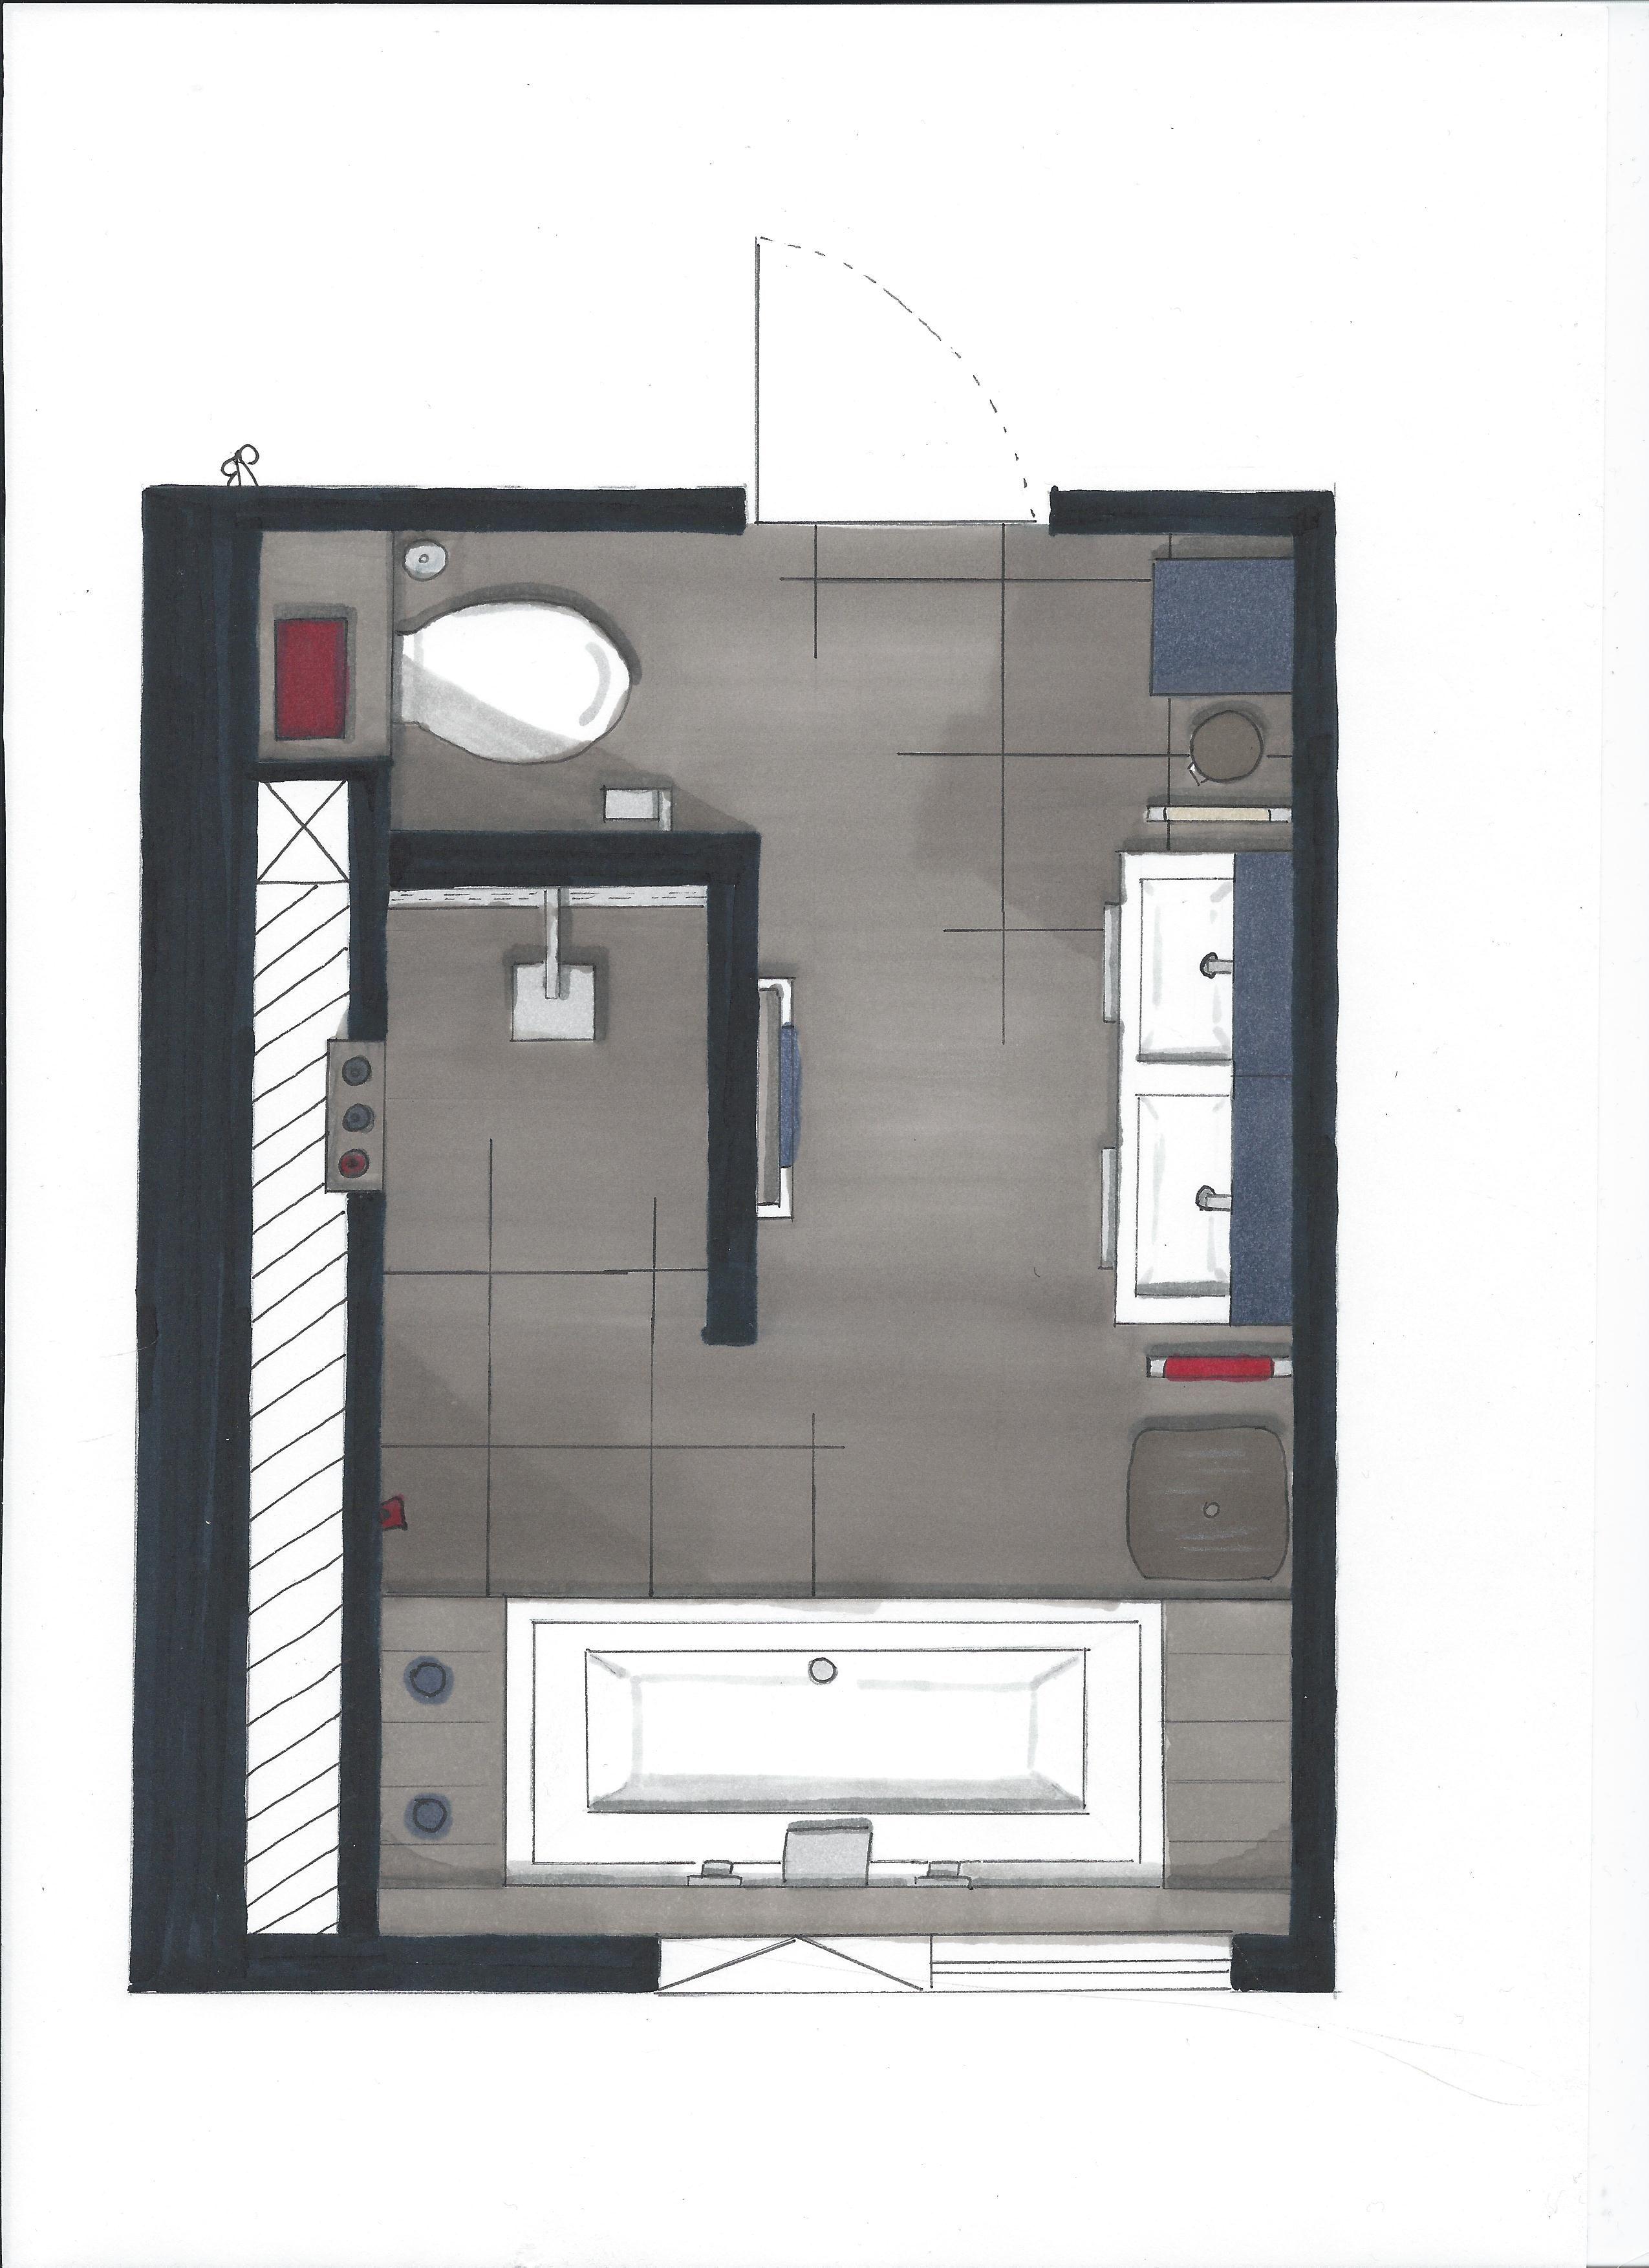 Plattegrond badkamer, inloopdouche, bad, dubbele wastafel en apart ...